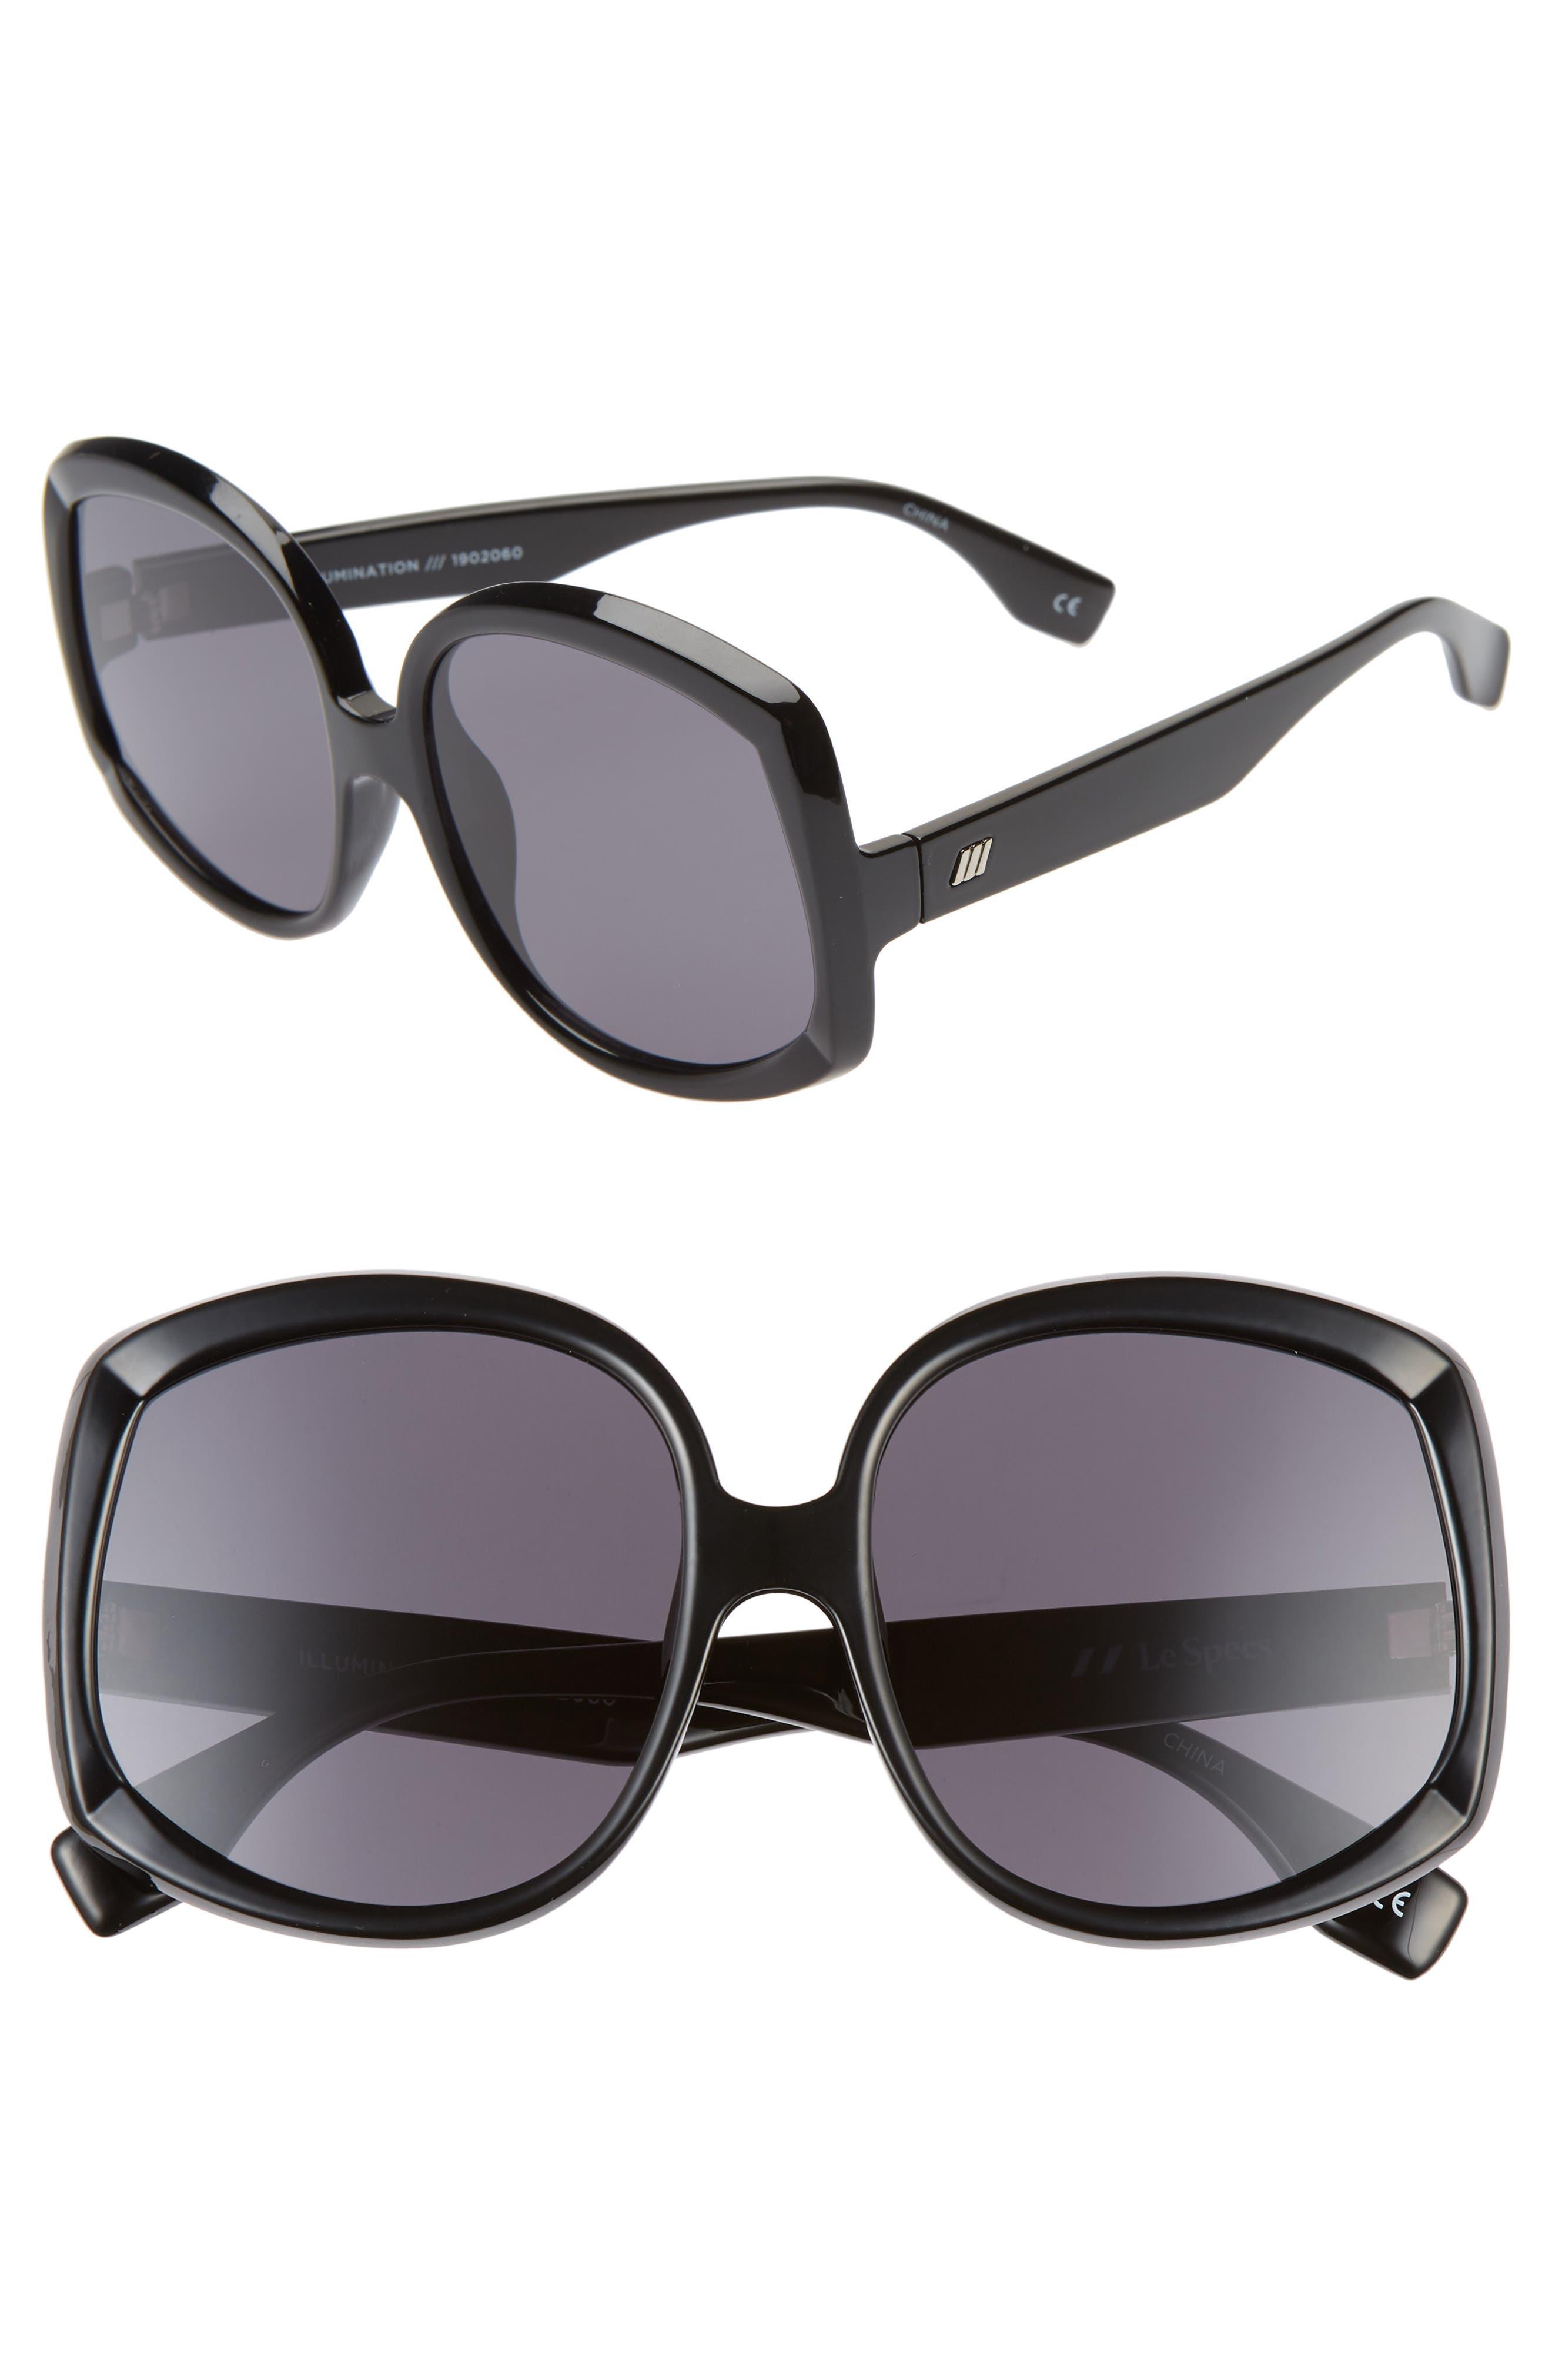 Le Specs Illumination 5m Square Sunglasses - Black/ Smoke